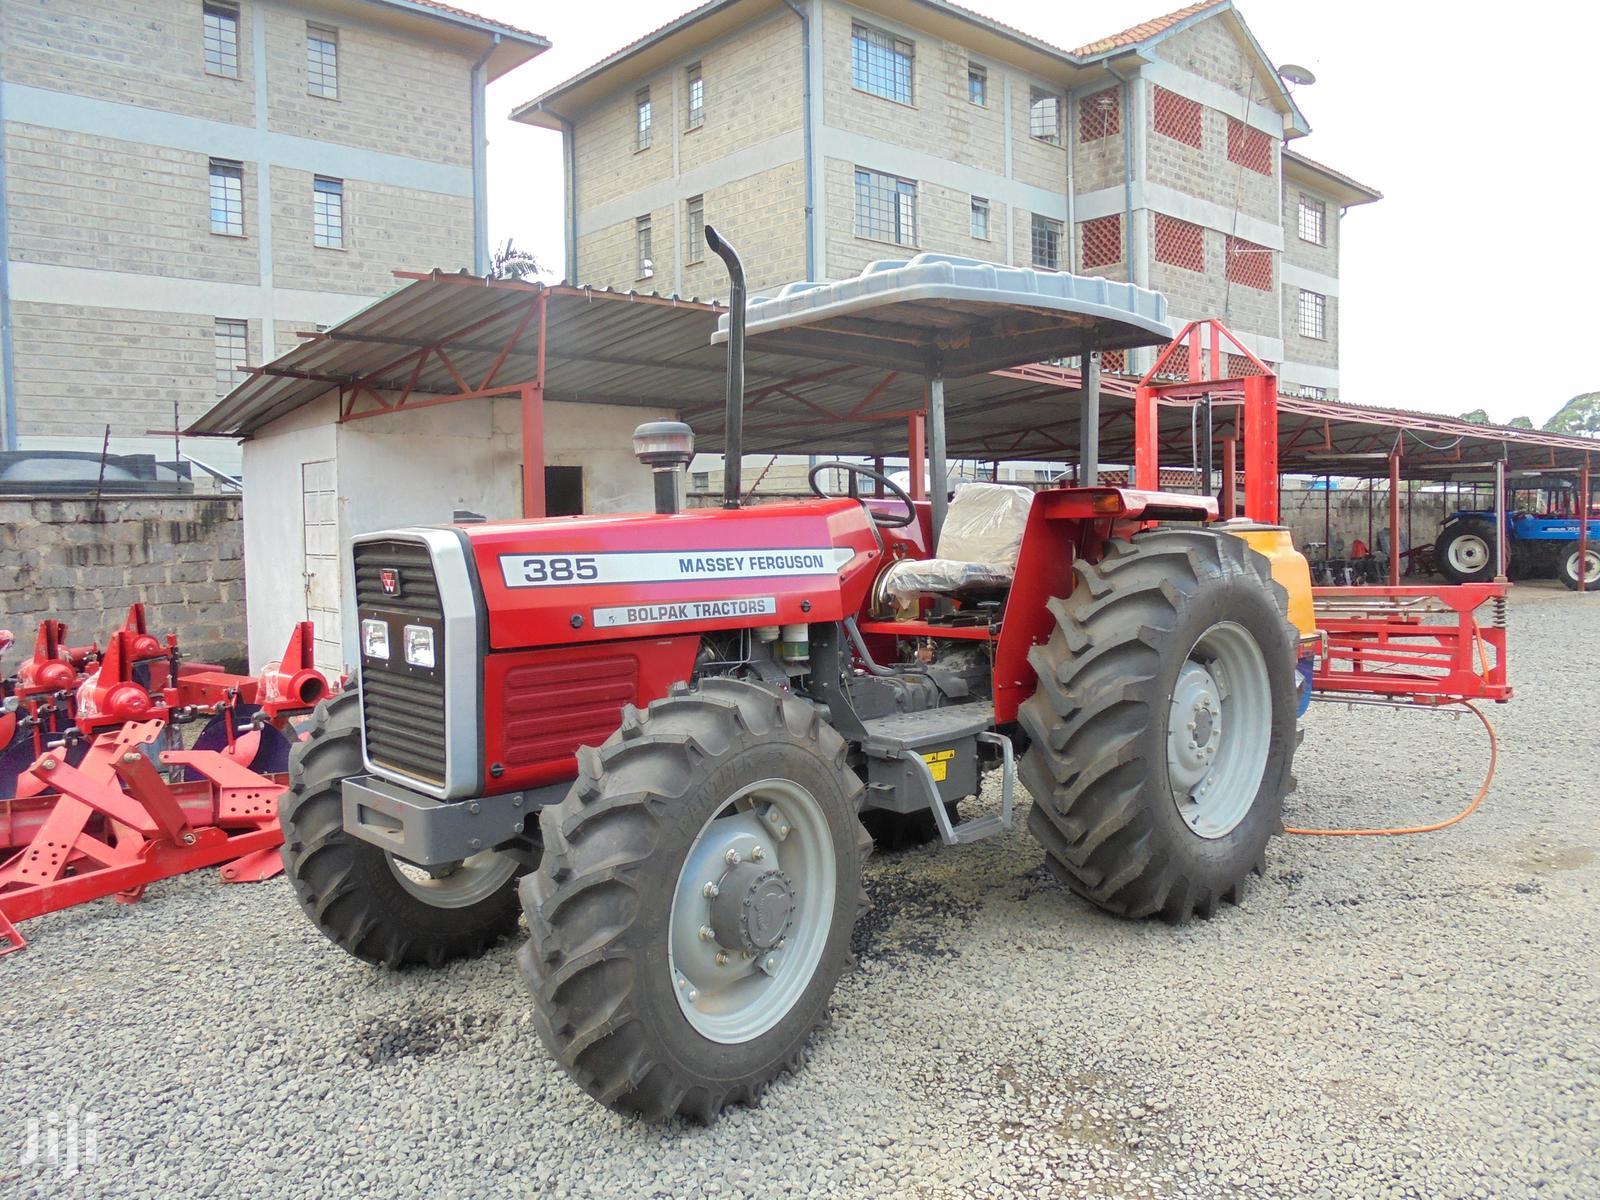 4 Wheel Drive Tractor Mf 385